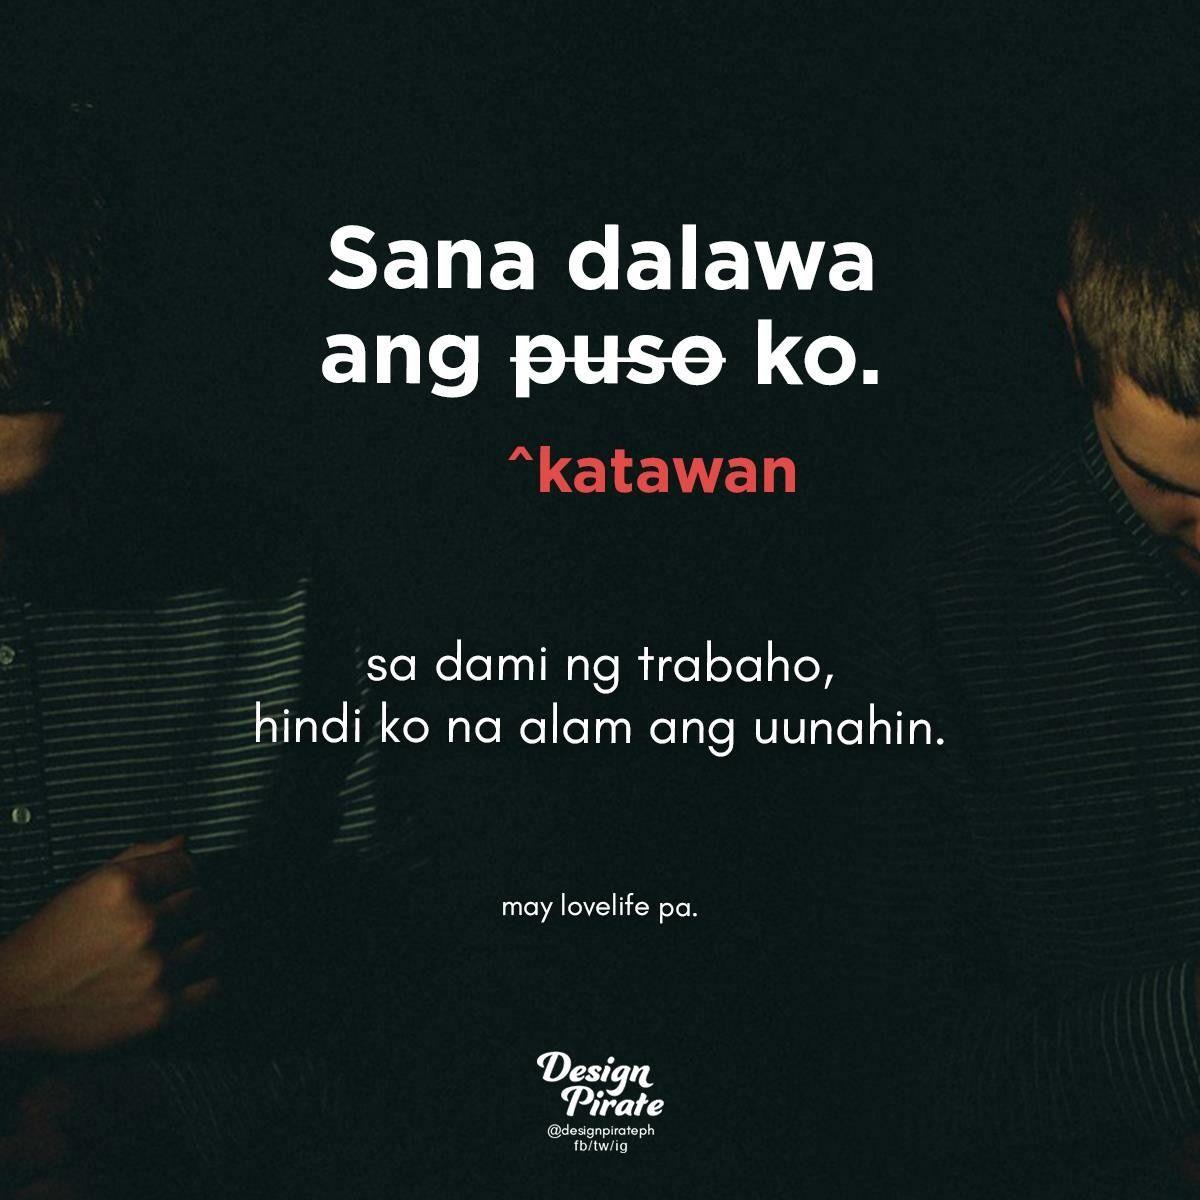 Pin By Brenda On Filipinoism Pinterest Filipino Quotes Tagalog